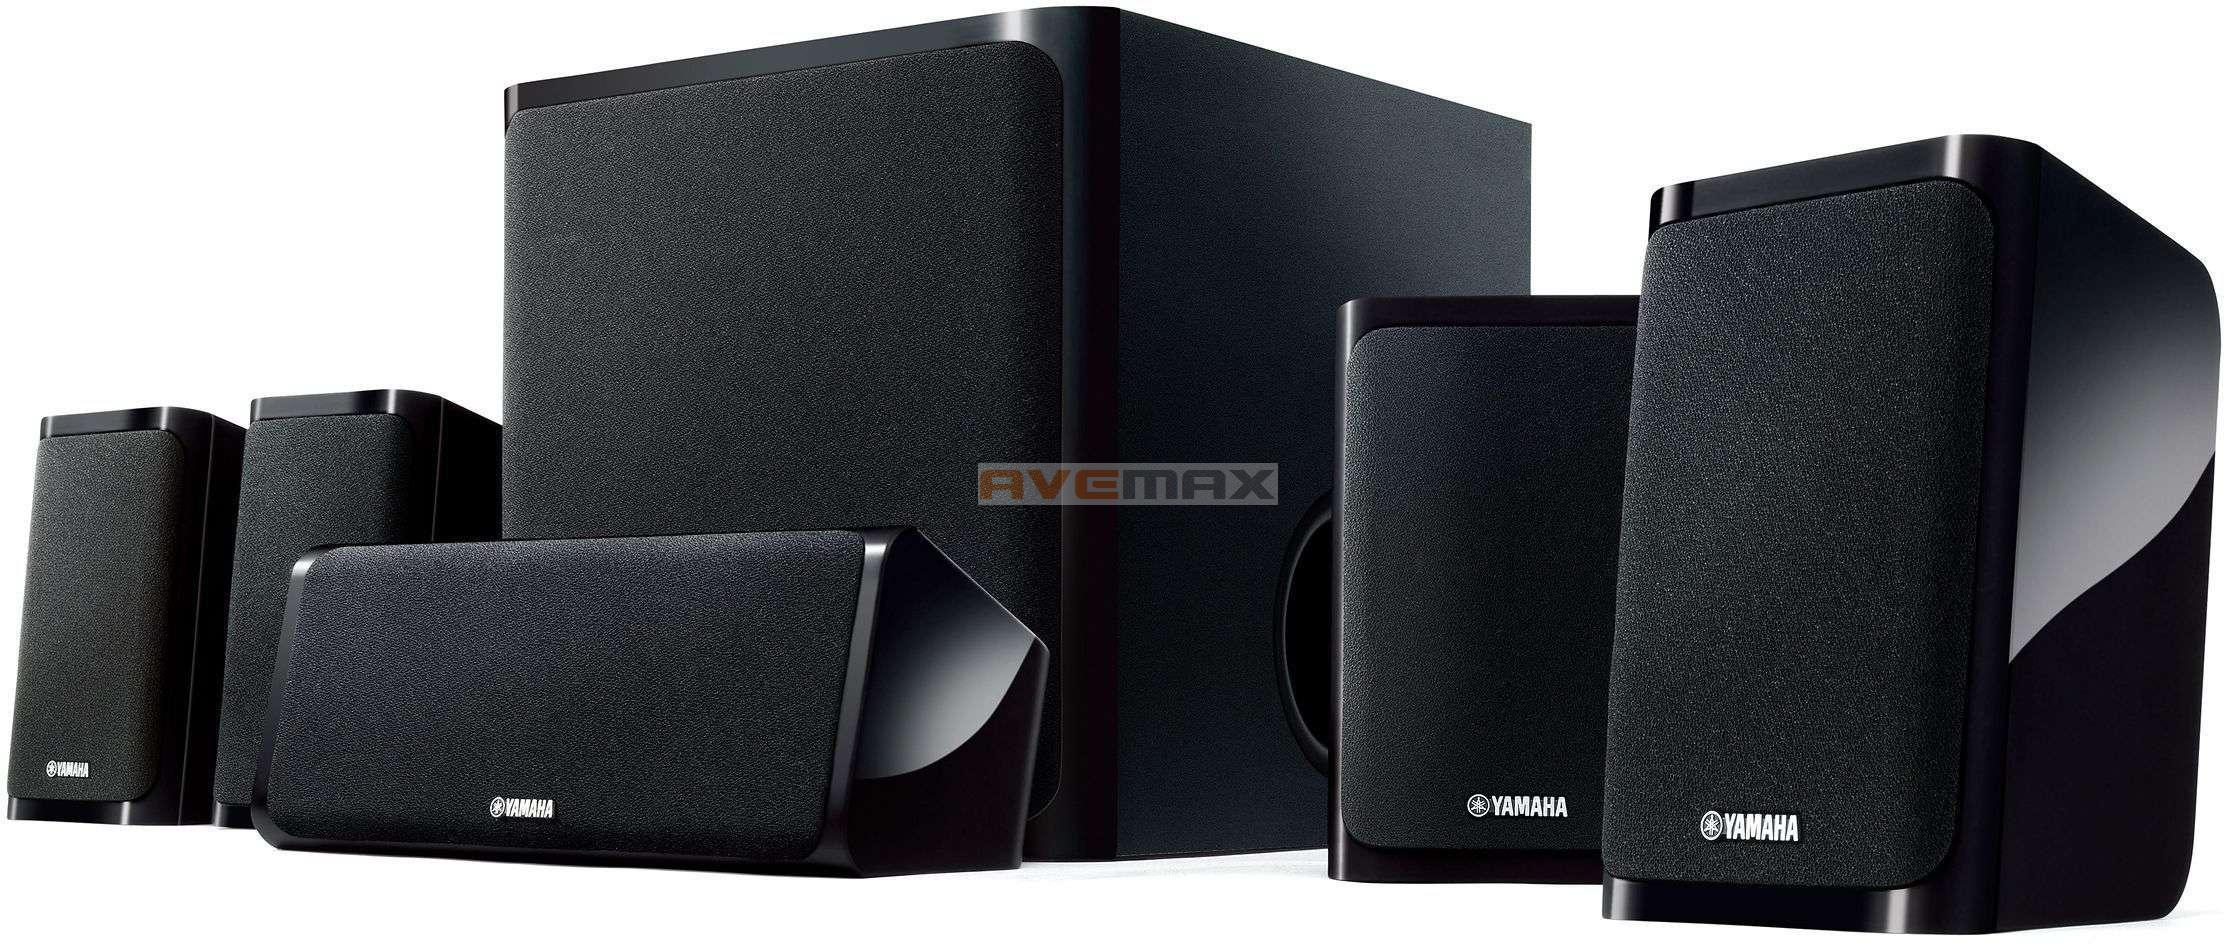 yamaha ns p40 b yamaha shop yamaha audio premium hifi. Black Bedroom Furniture Sets. Home Design Ideas